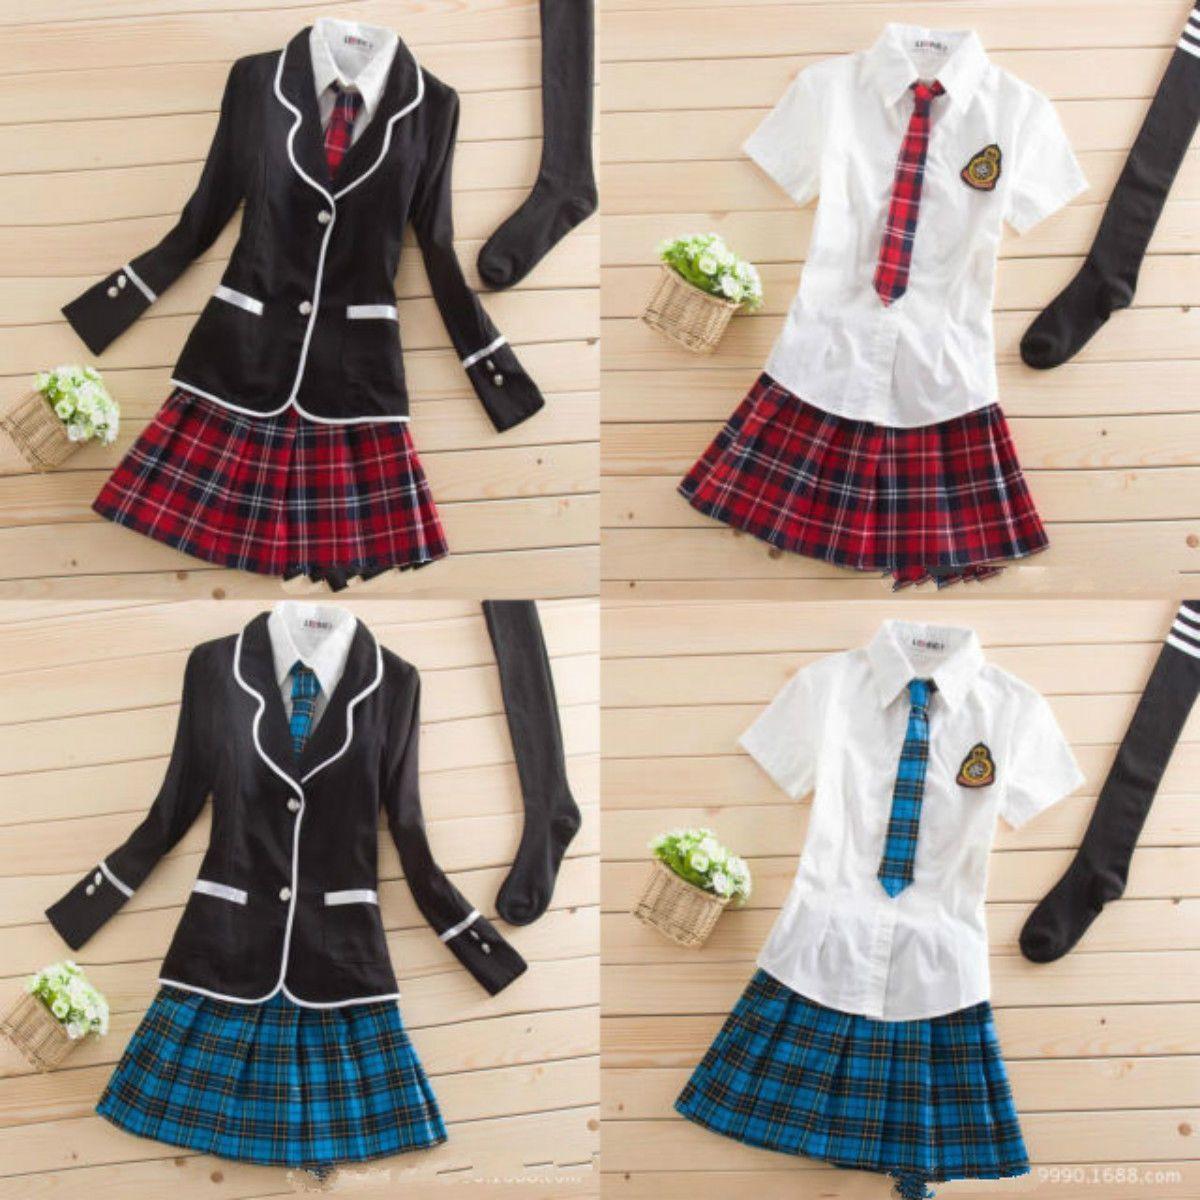 New Japanese School Girl Cute Sailor Uniform Dress Full Set Cosplay Costume School Girl Costume Cosplay Outfits School Uniform Outfits